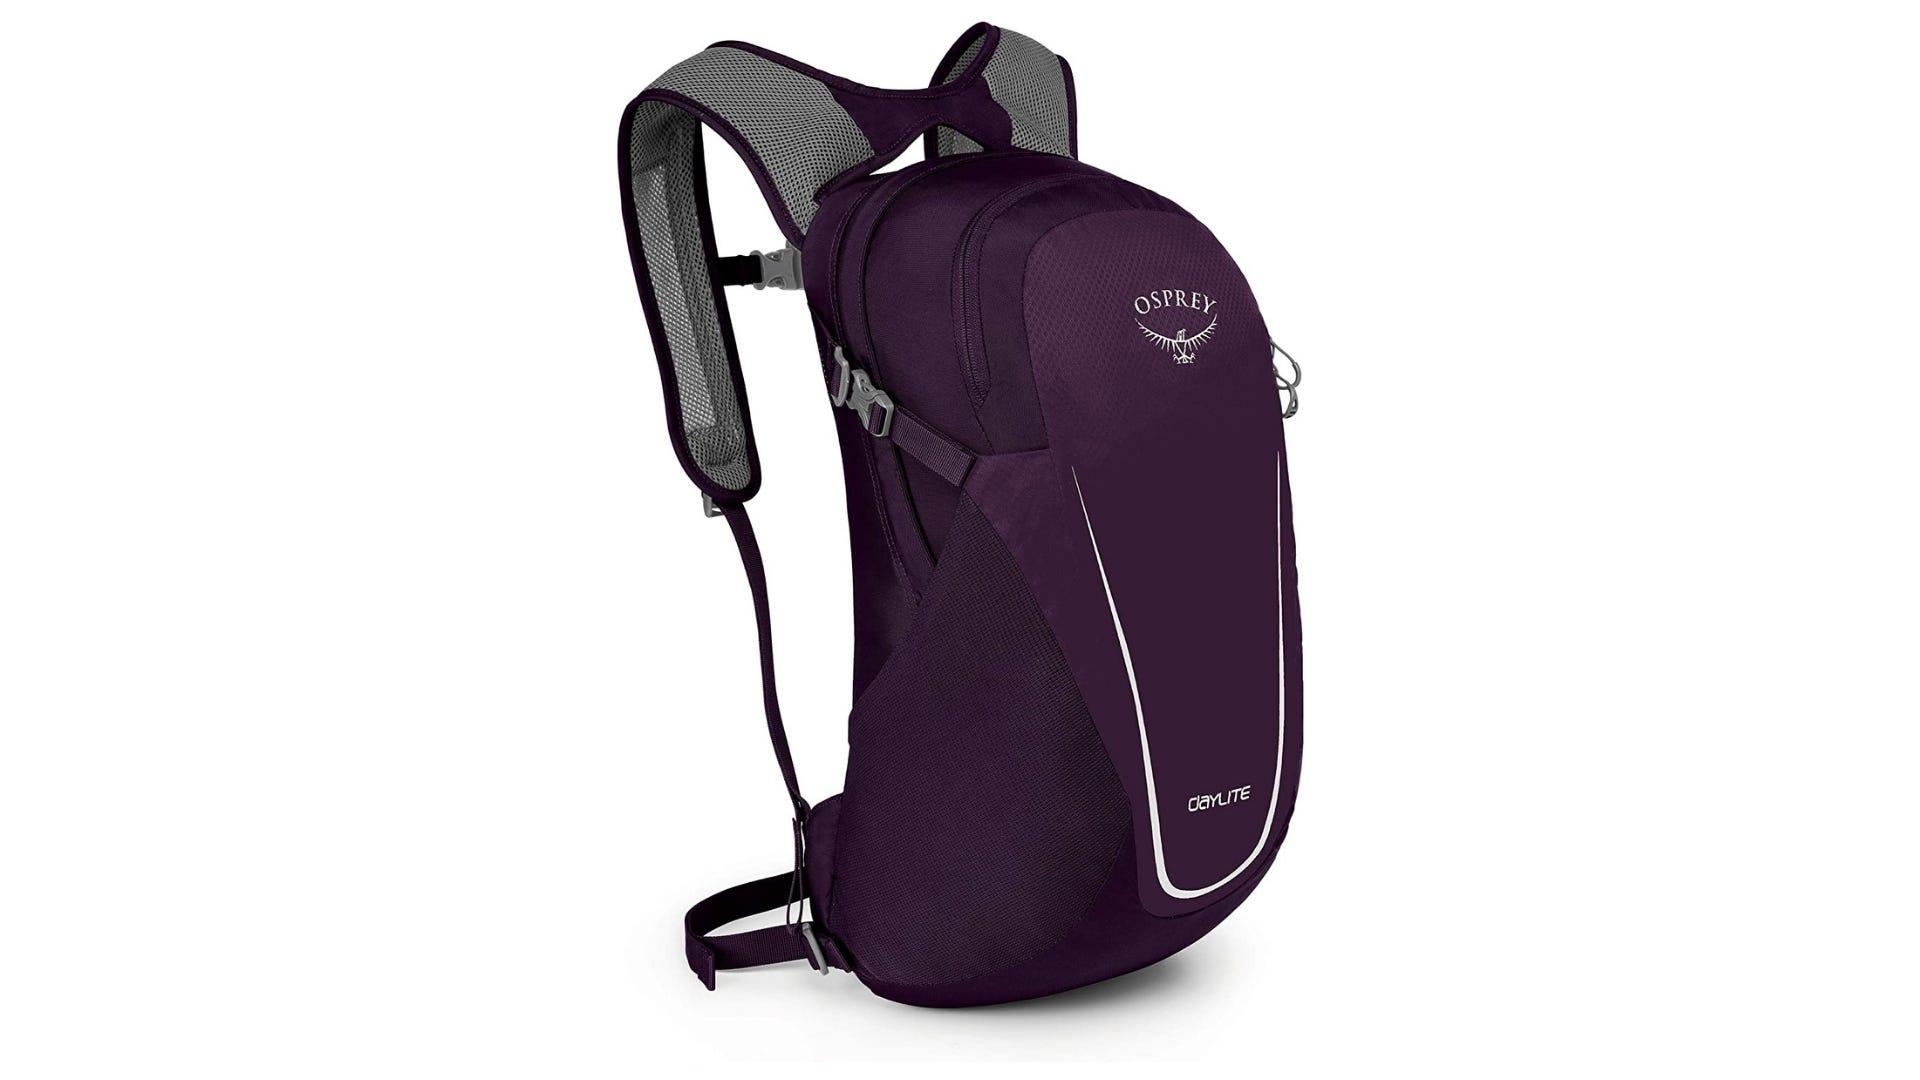 The purple Osprey Daylite backpack.